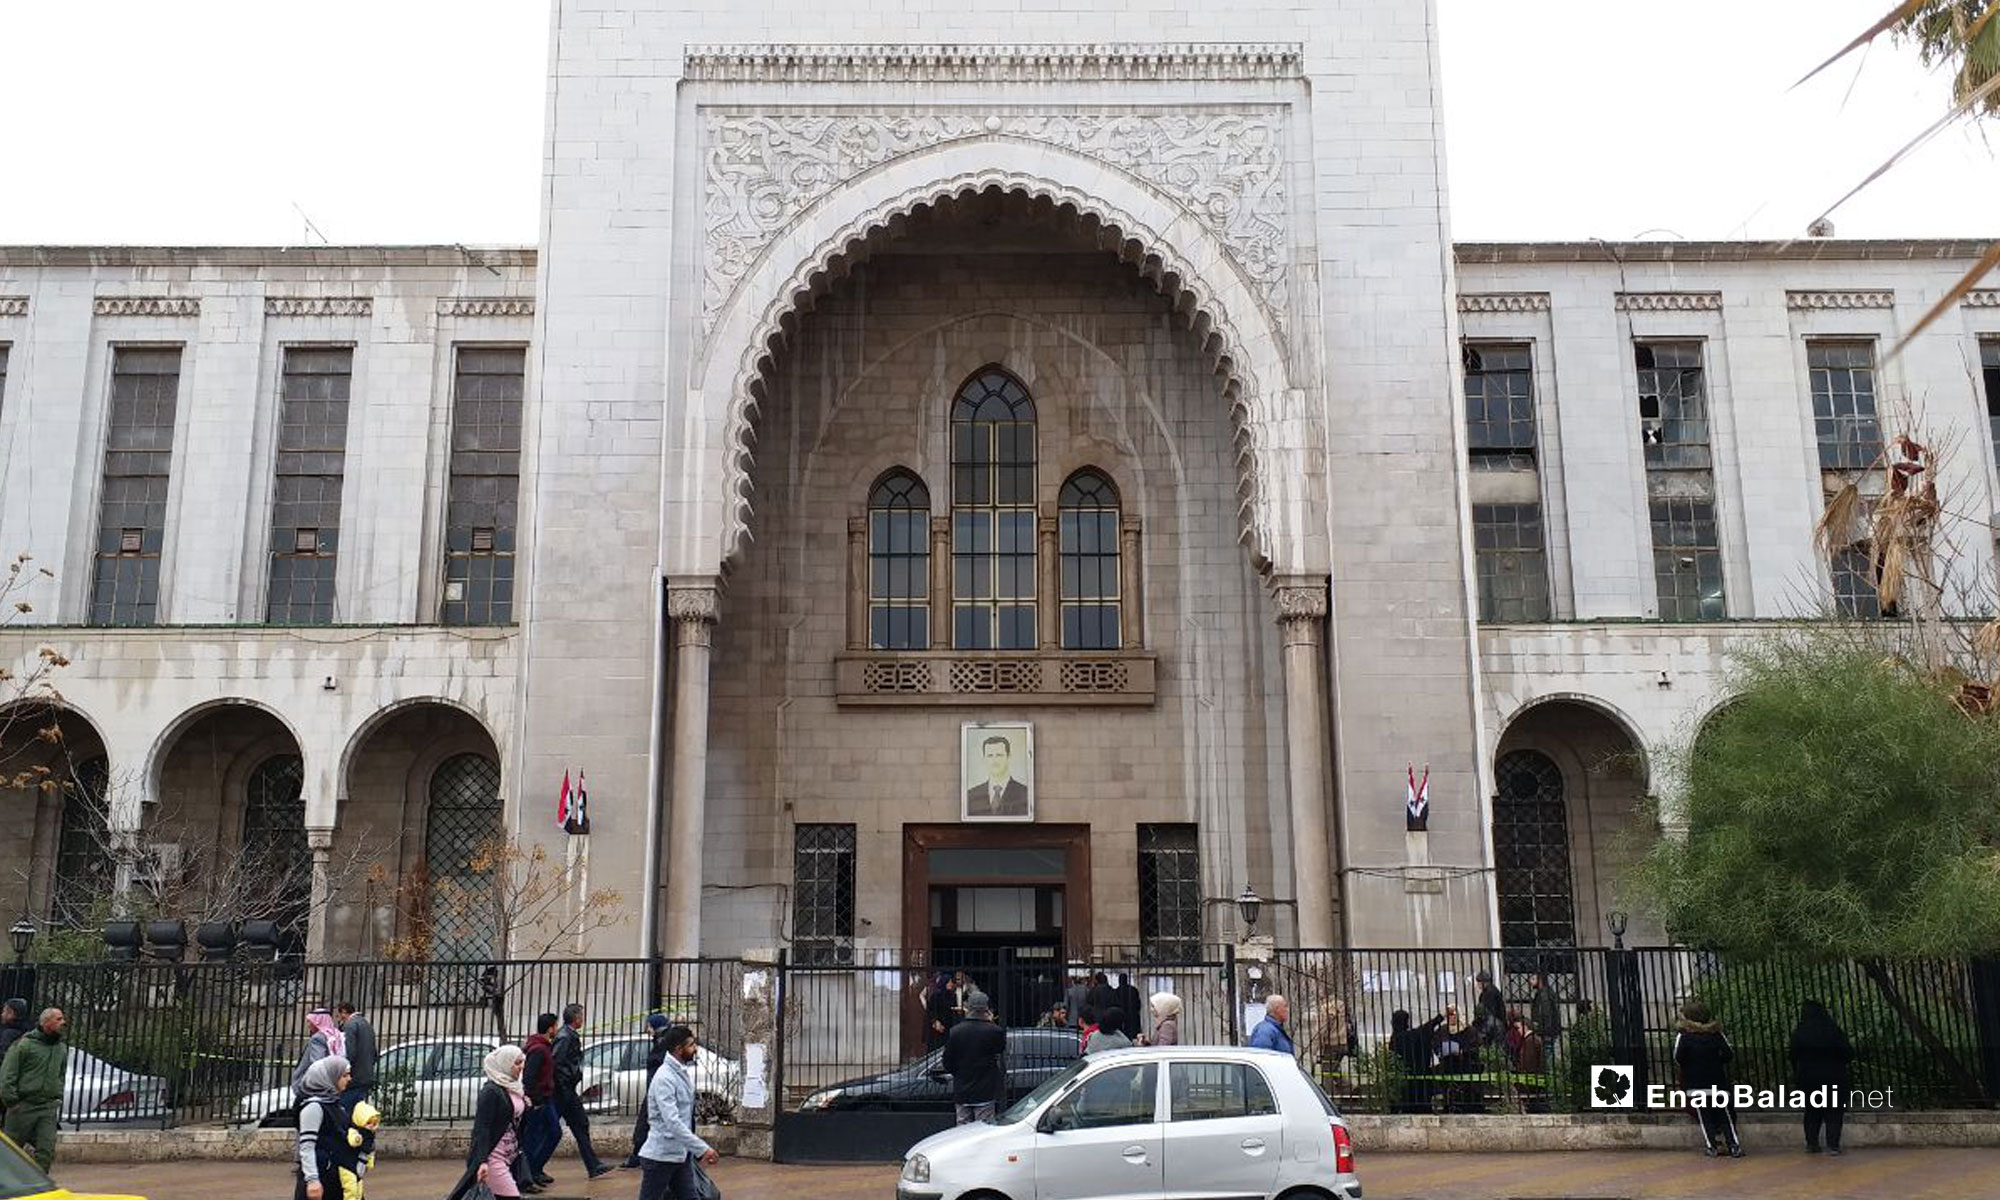 The Palace of Justice, Damascus - January 12, 2019 (Enab Baladi)